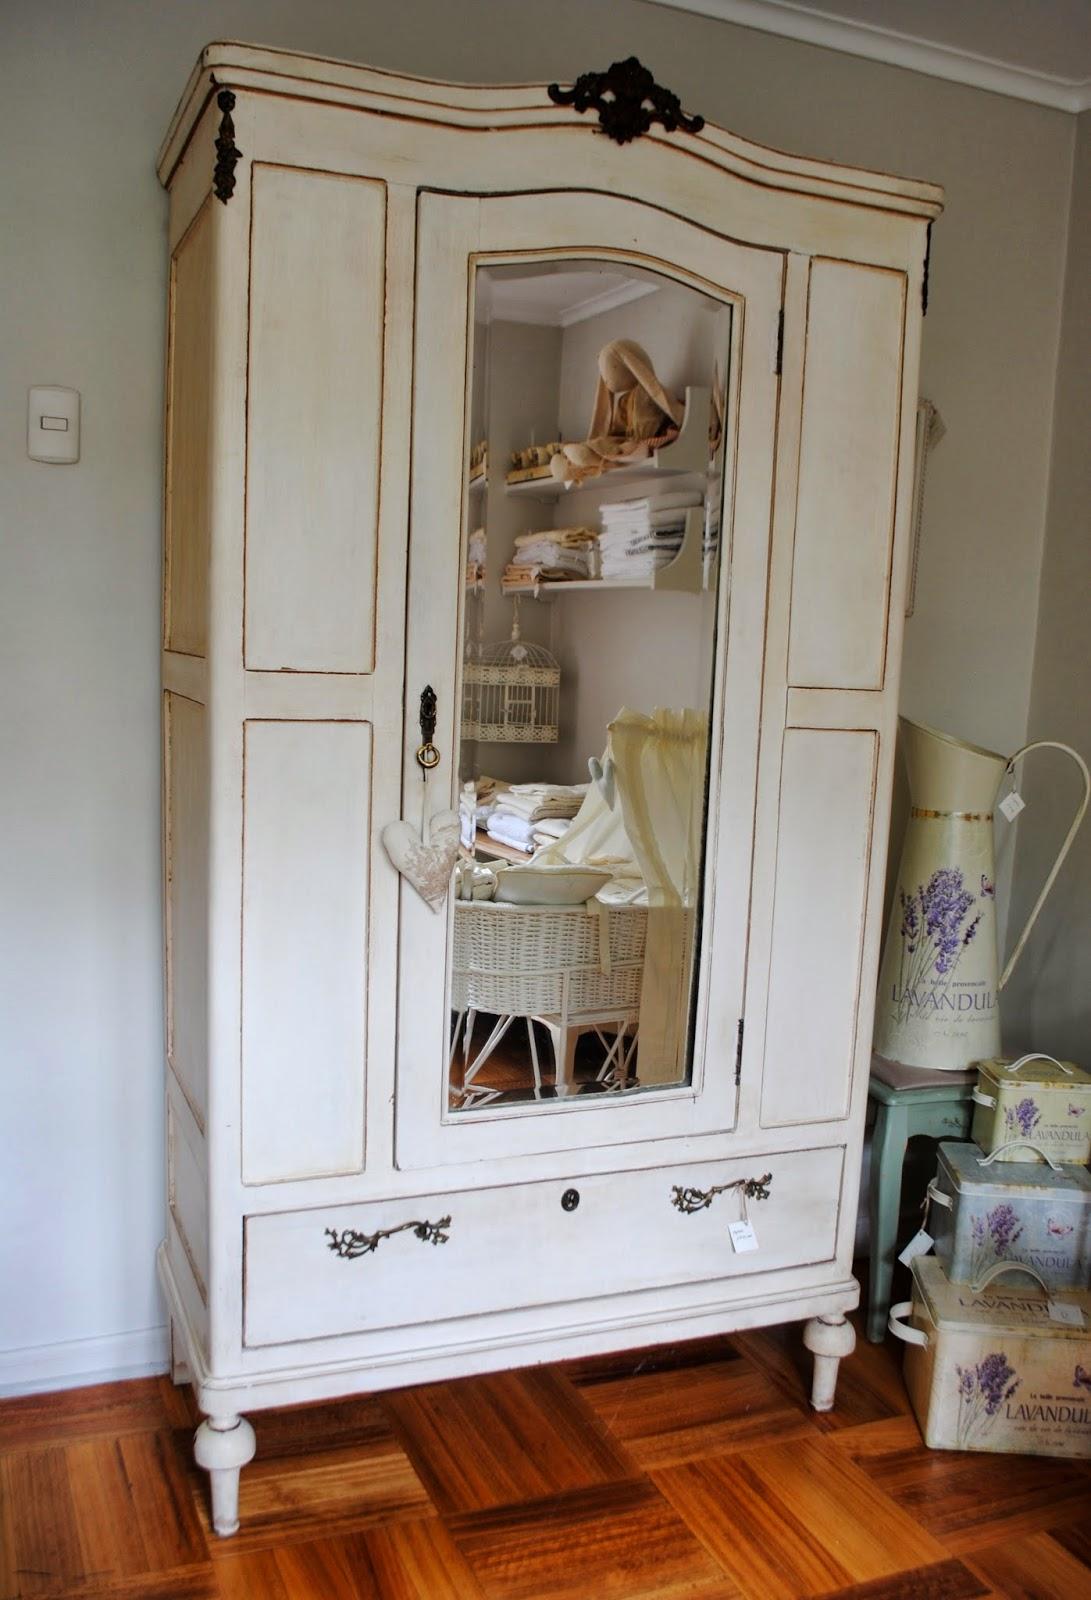 Paz montealegre decoraci n muebles varios - Ropero antiguo ...